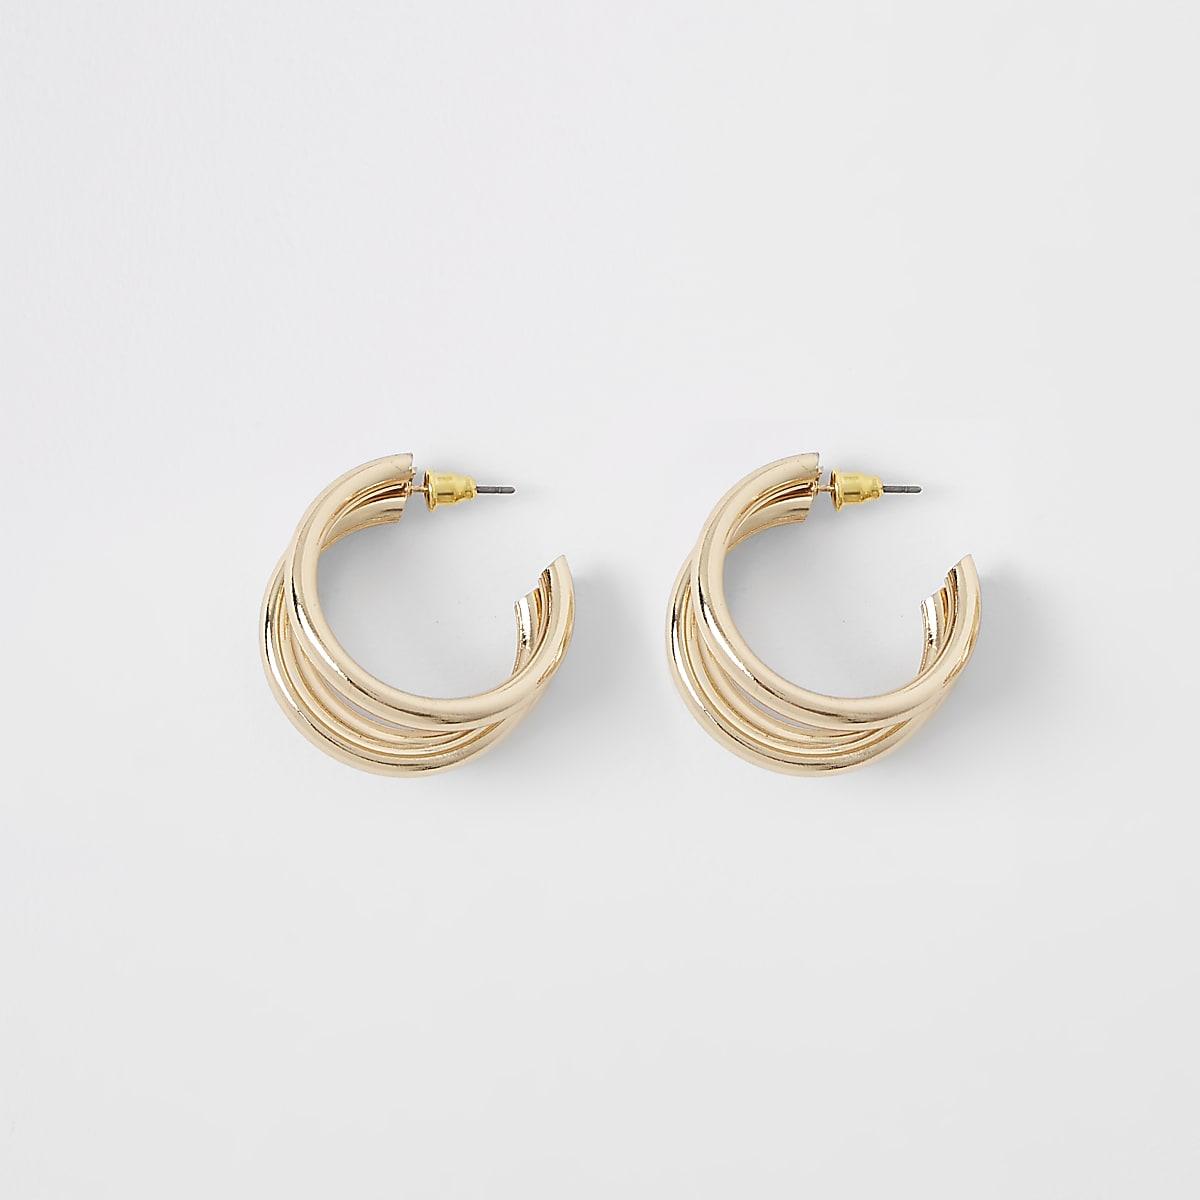 Gold tone triple layered hoop earrings